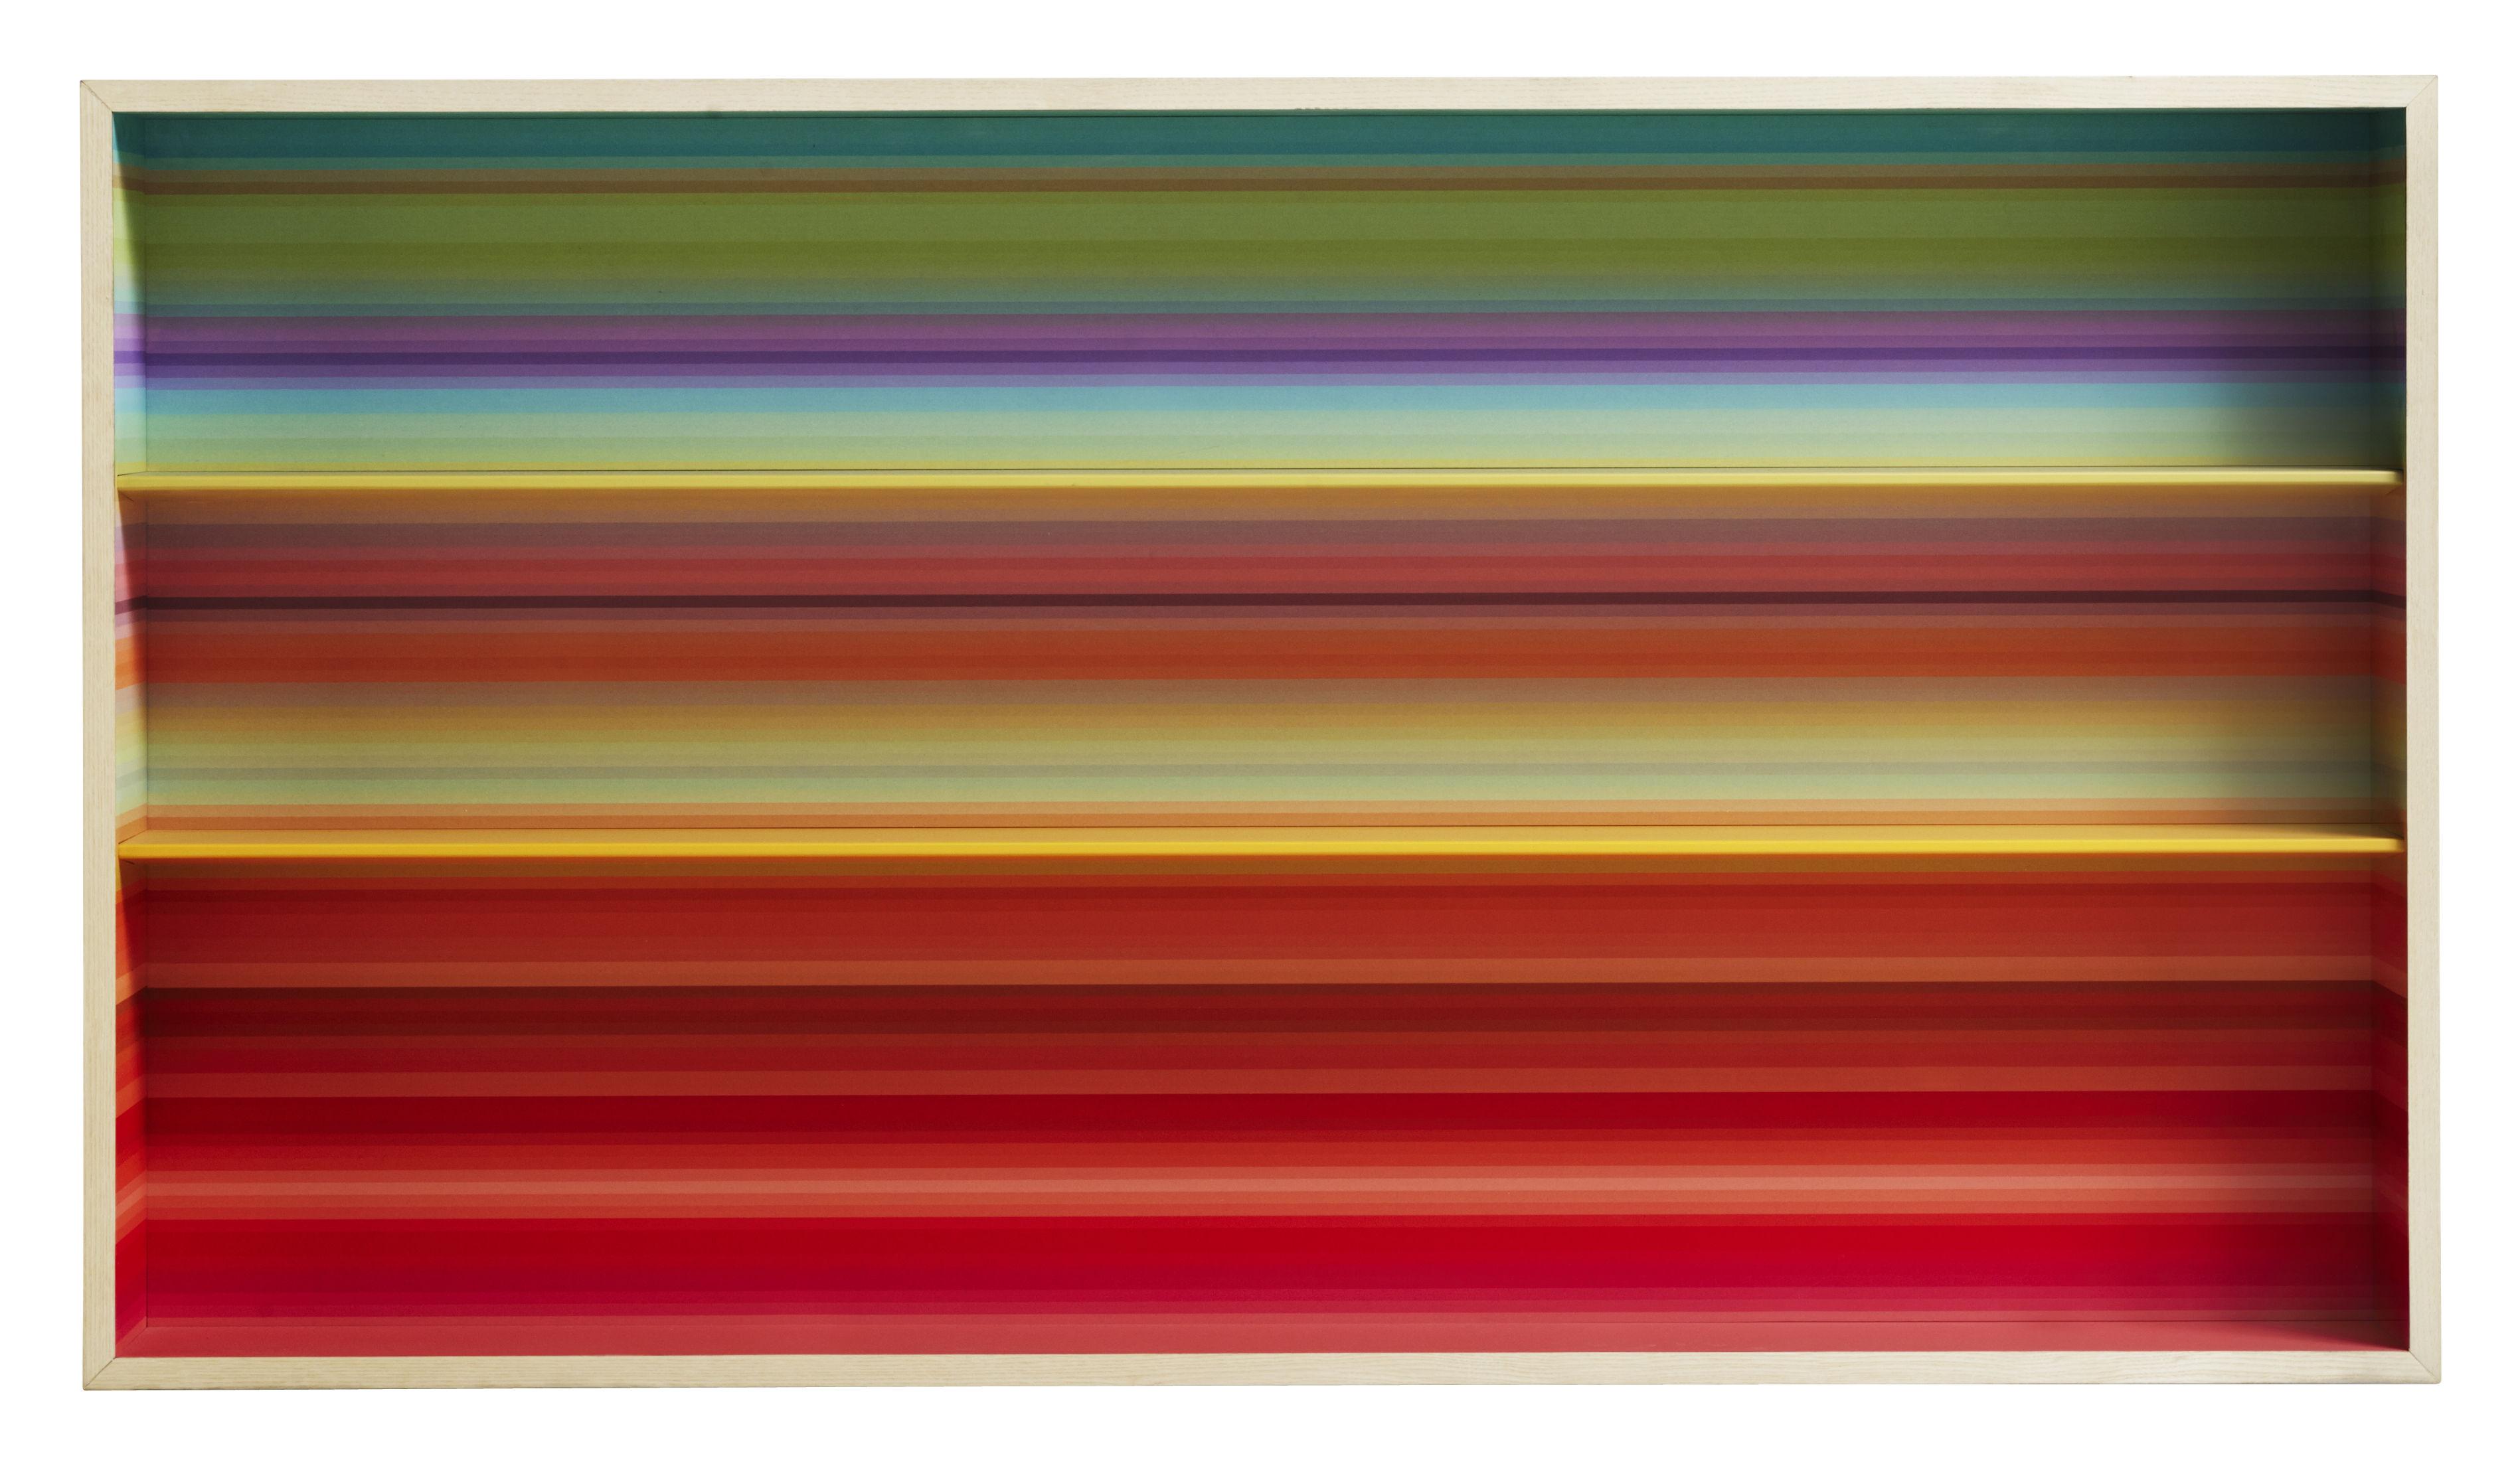 Möbel - Regale und Bücherregale - Color Fall Regal / L 135 x H 75 cm - Casamania - Helles Holz / Innenseite mehrfarbig - Melamin